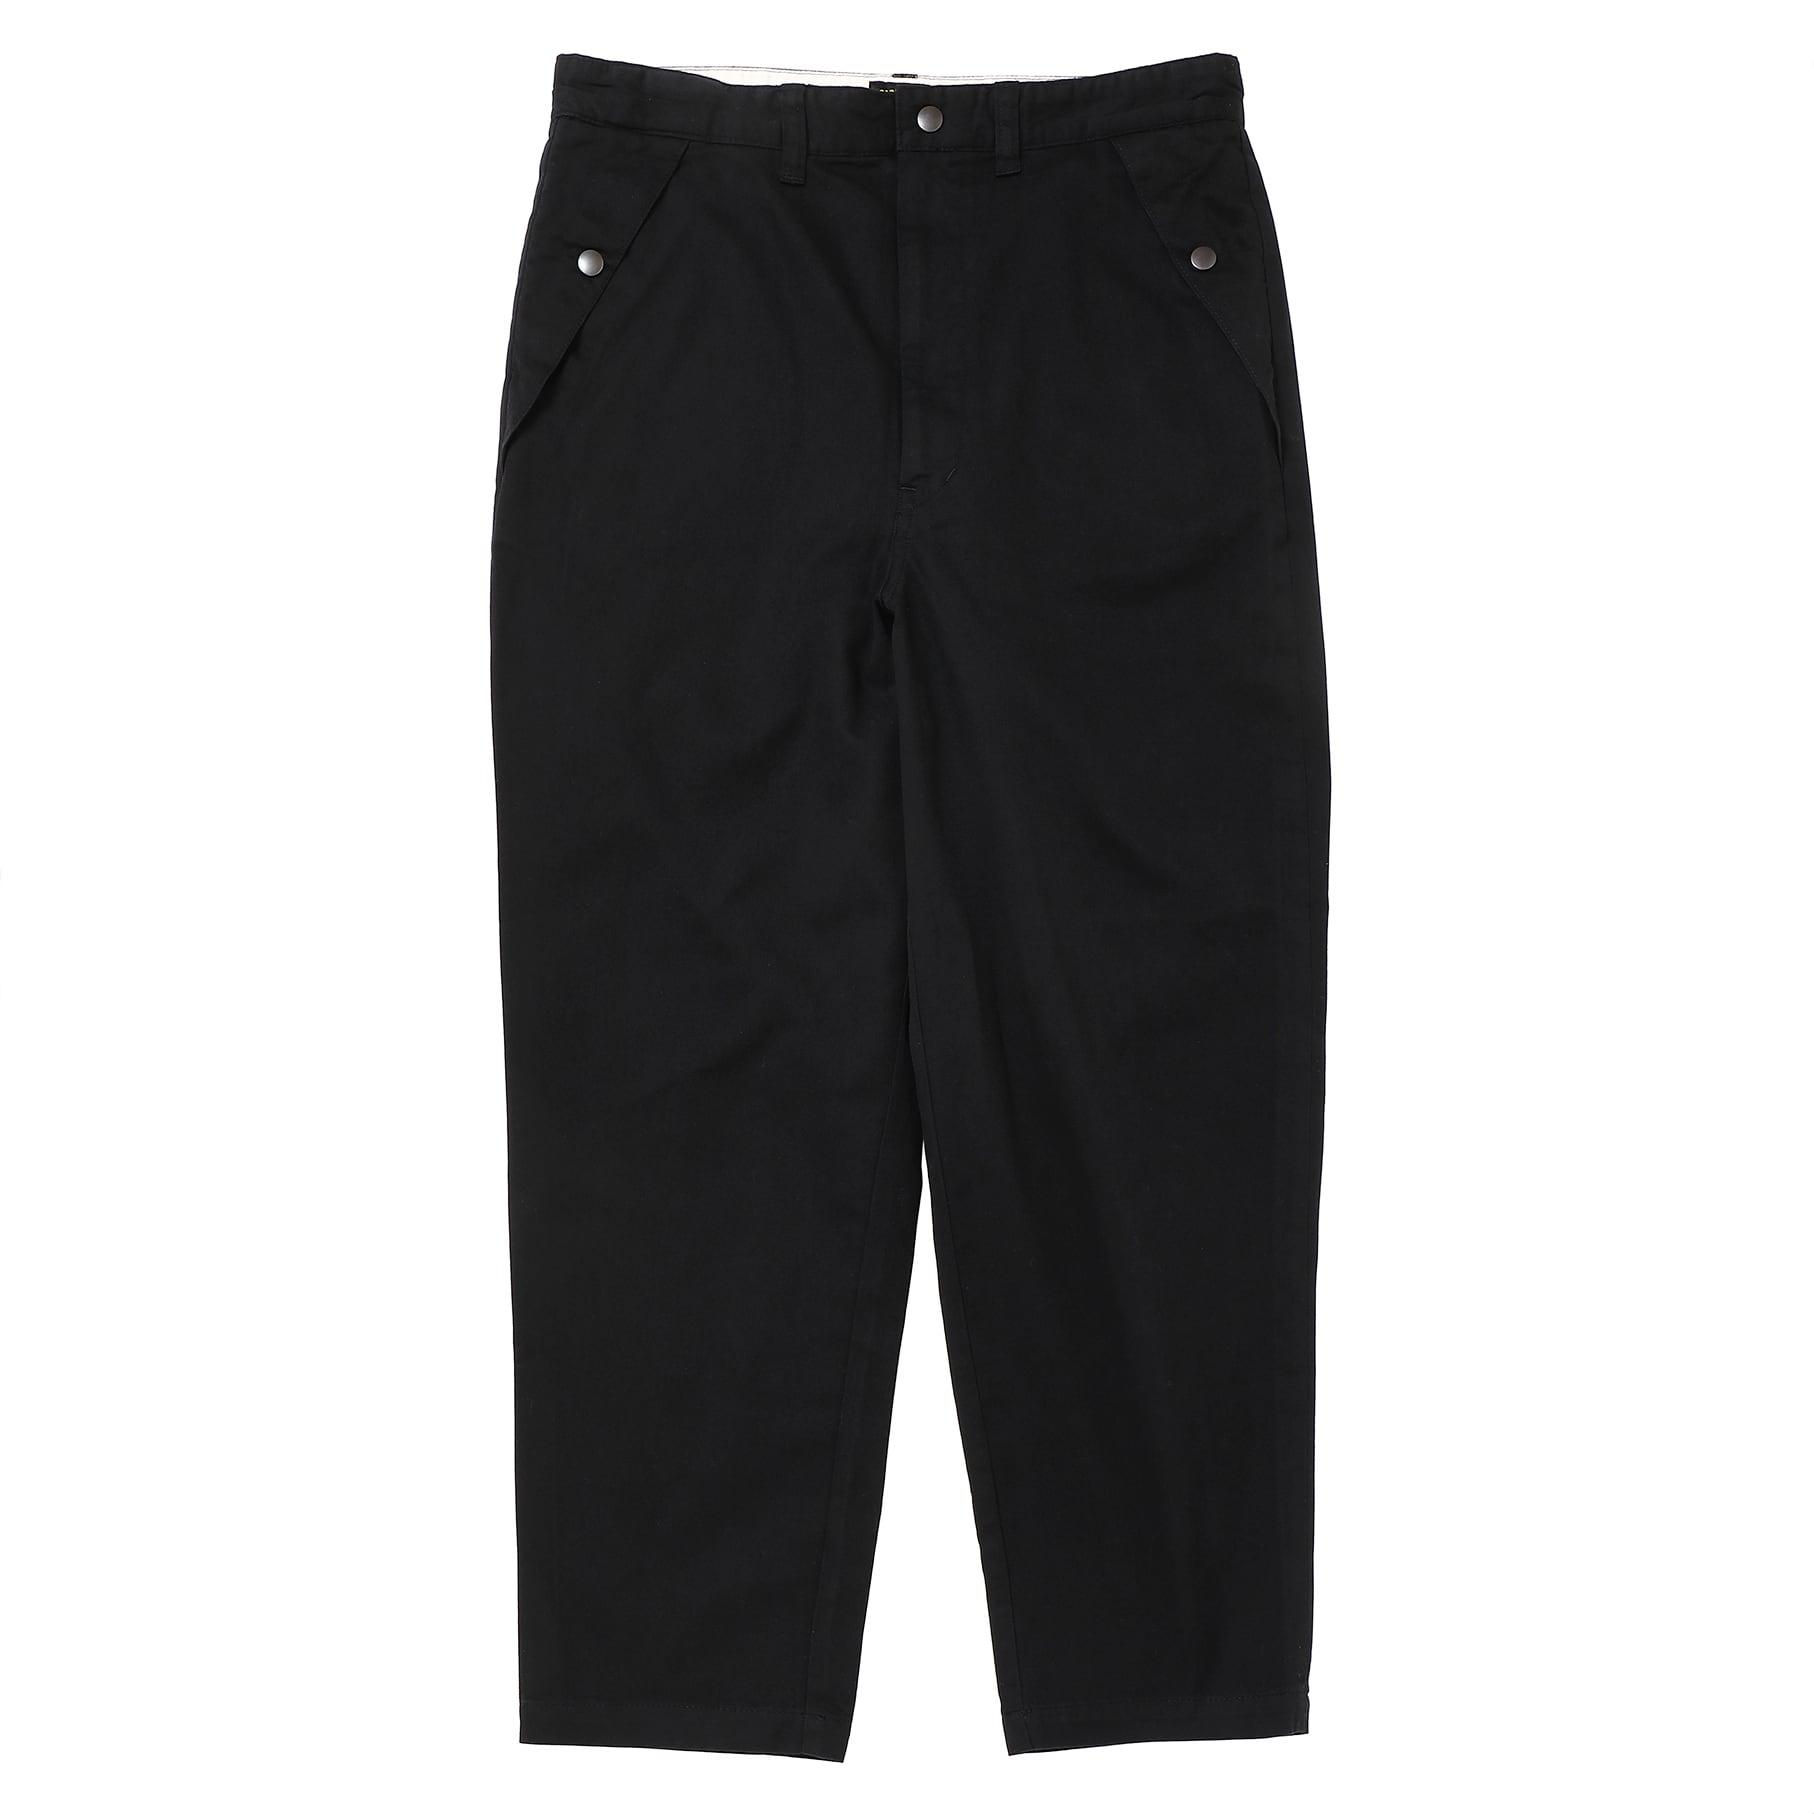 LOOSE FIT CHINO PANTS/BLACK